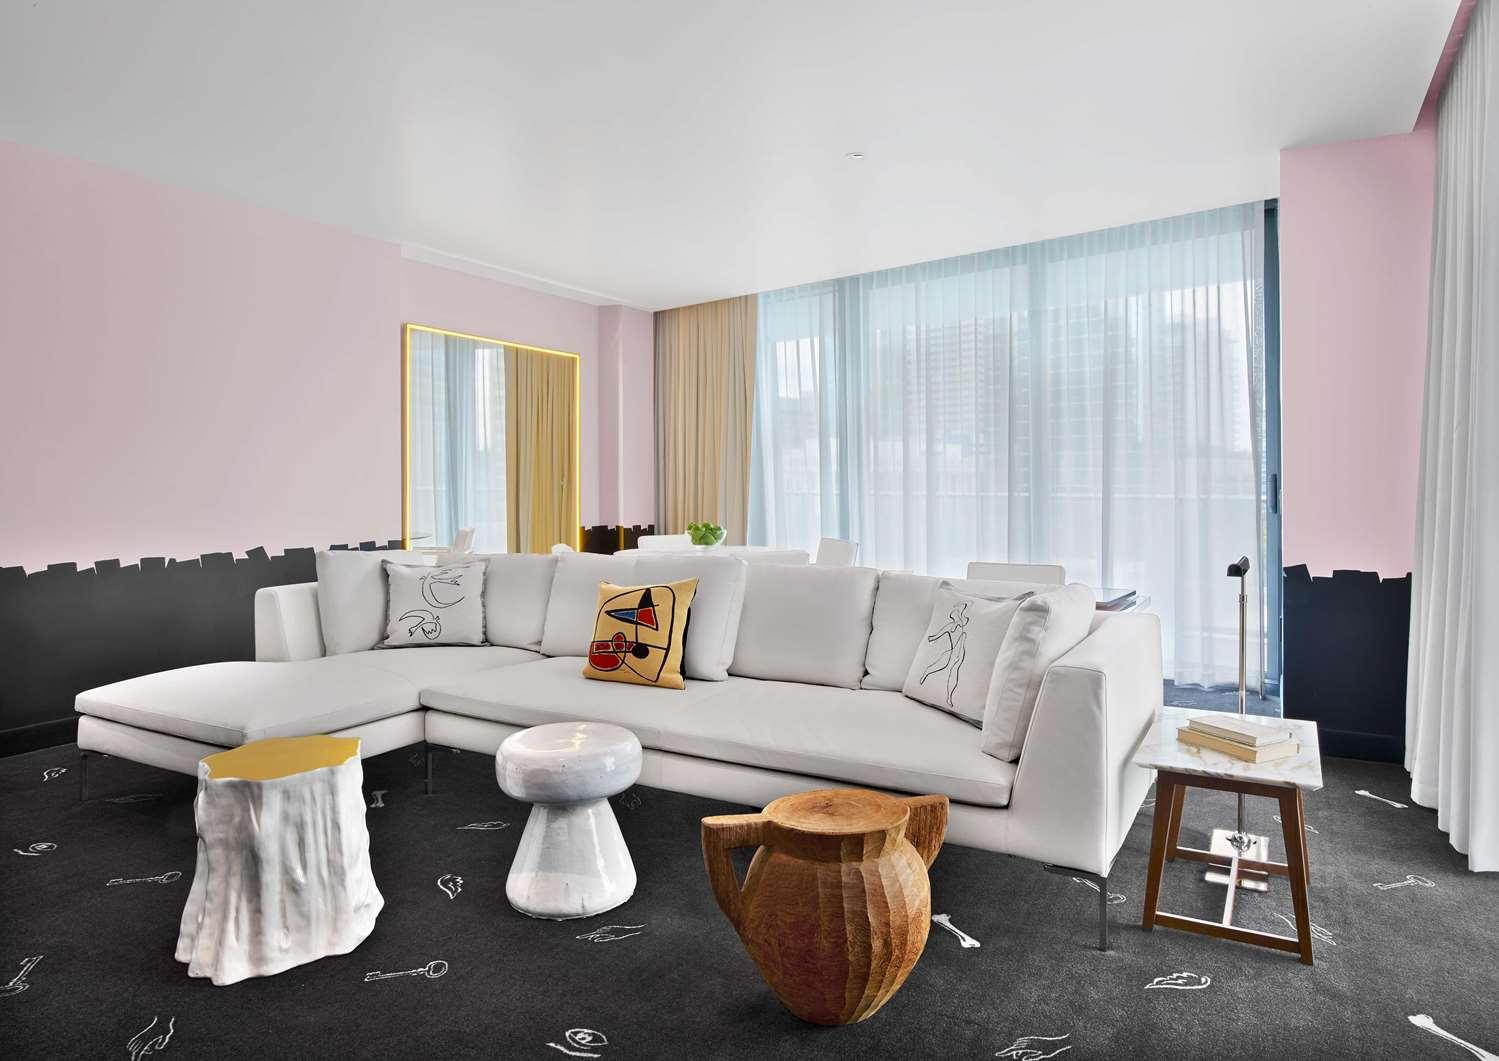 proam - SLS Hotel Residences Miami